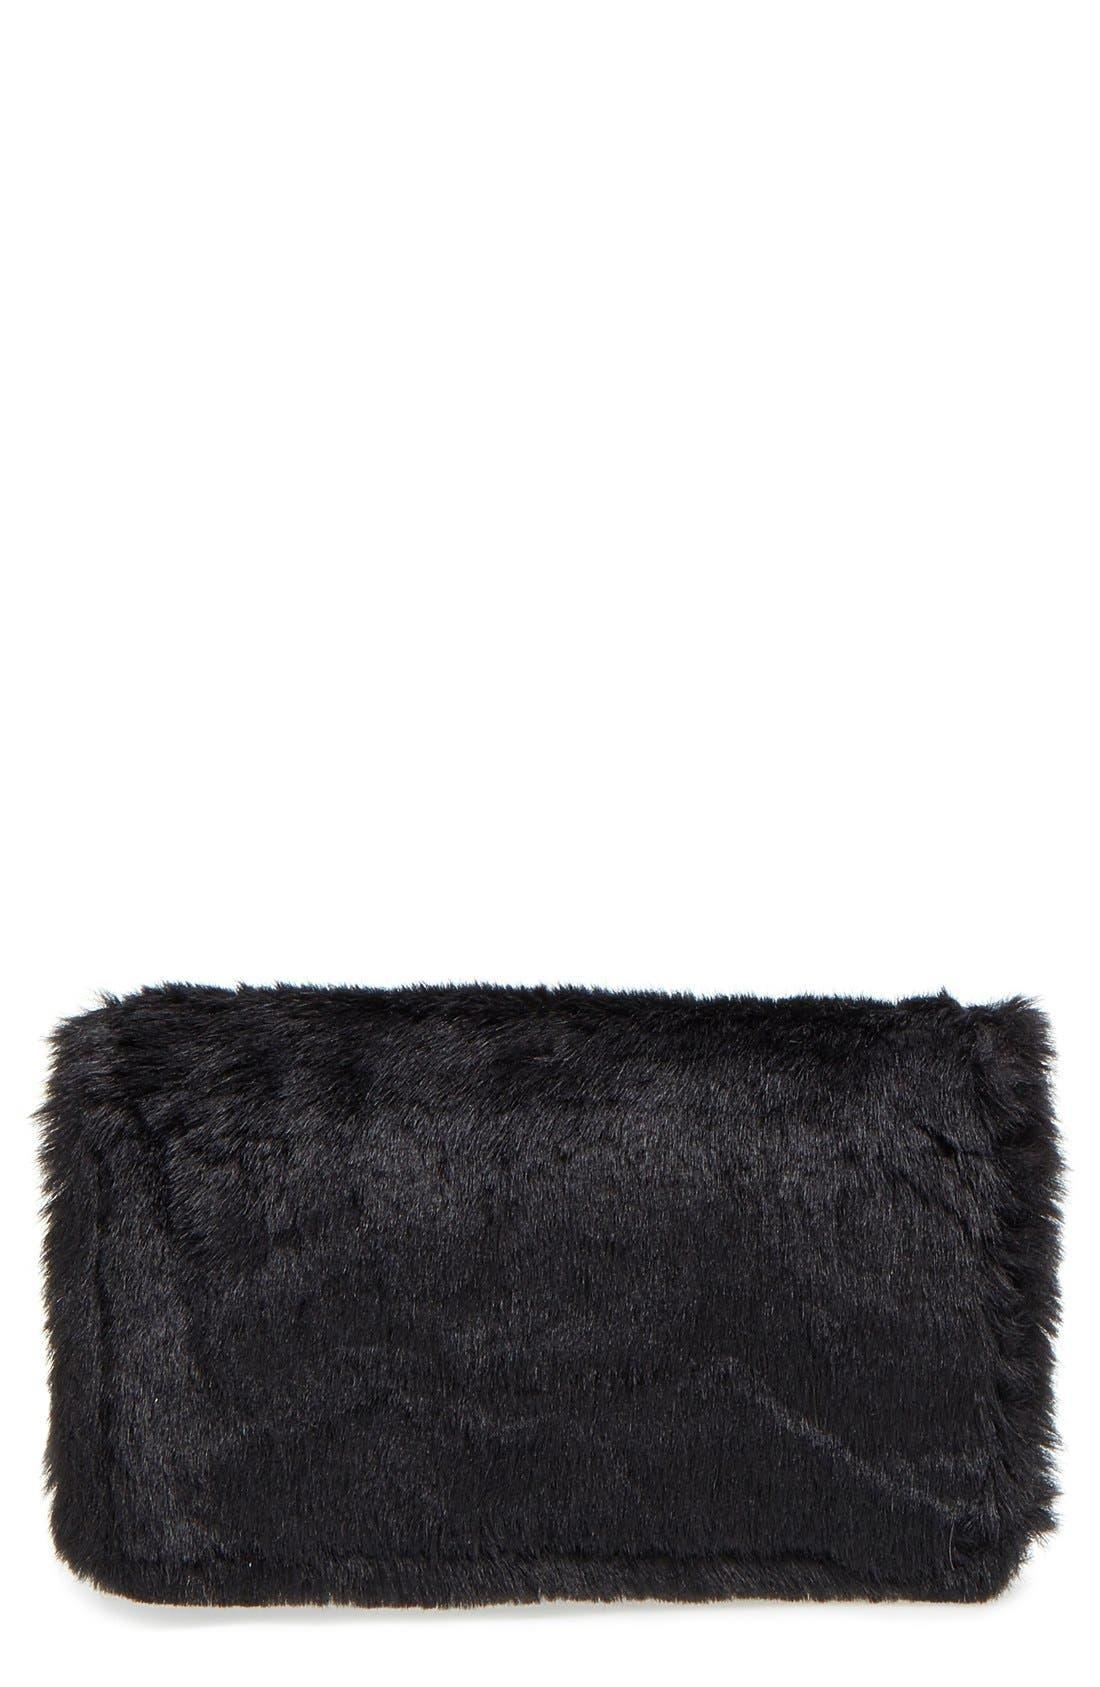 Faux Fur Flap Crossbody Clutch,                         Main,                         color, Black